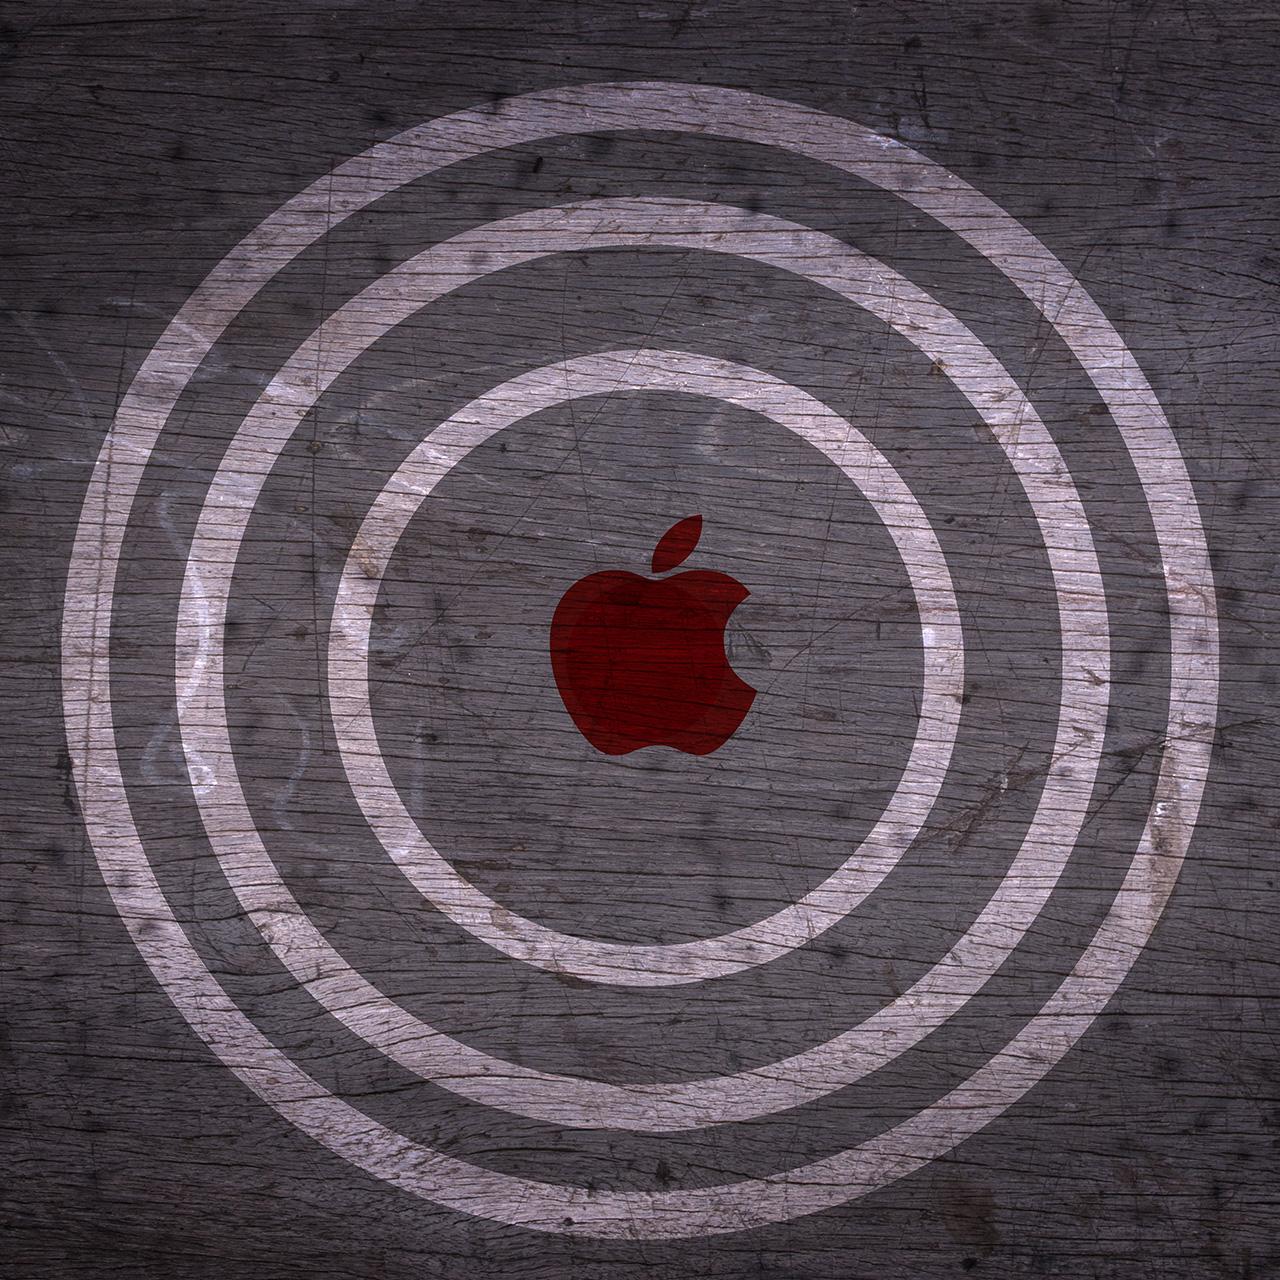 apple-vulnerability-2-FB-2